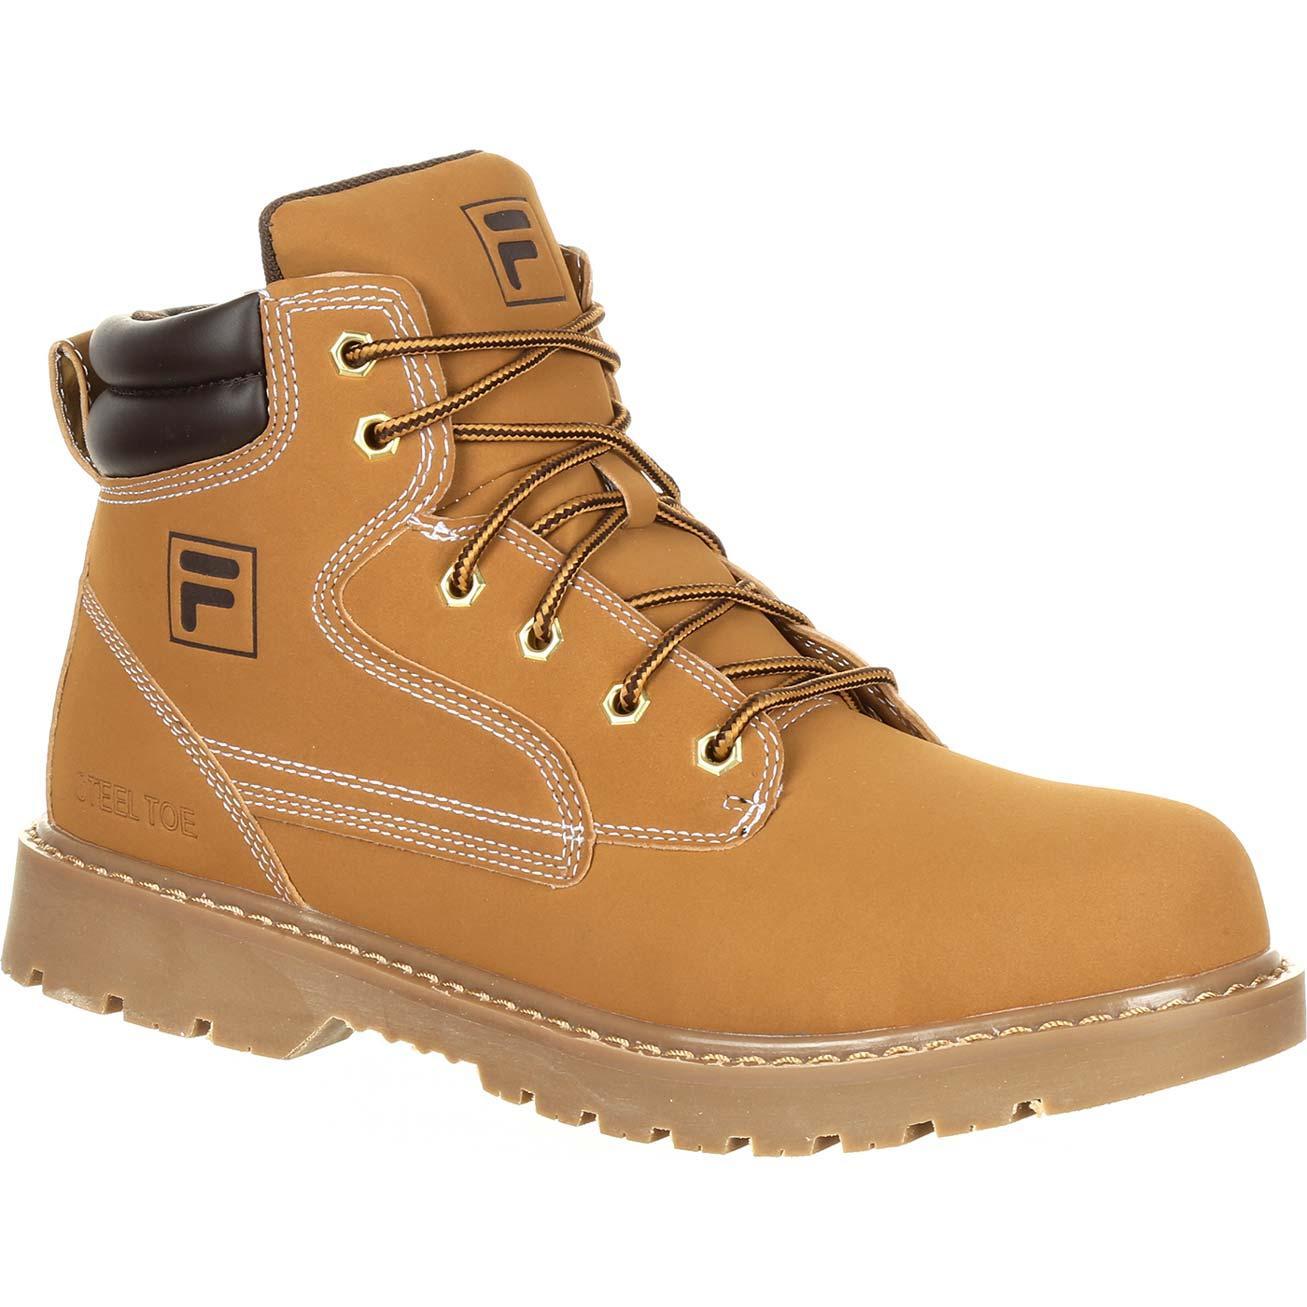 c444f57d7e Fila Landing Steel Toe Work Boot